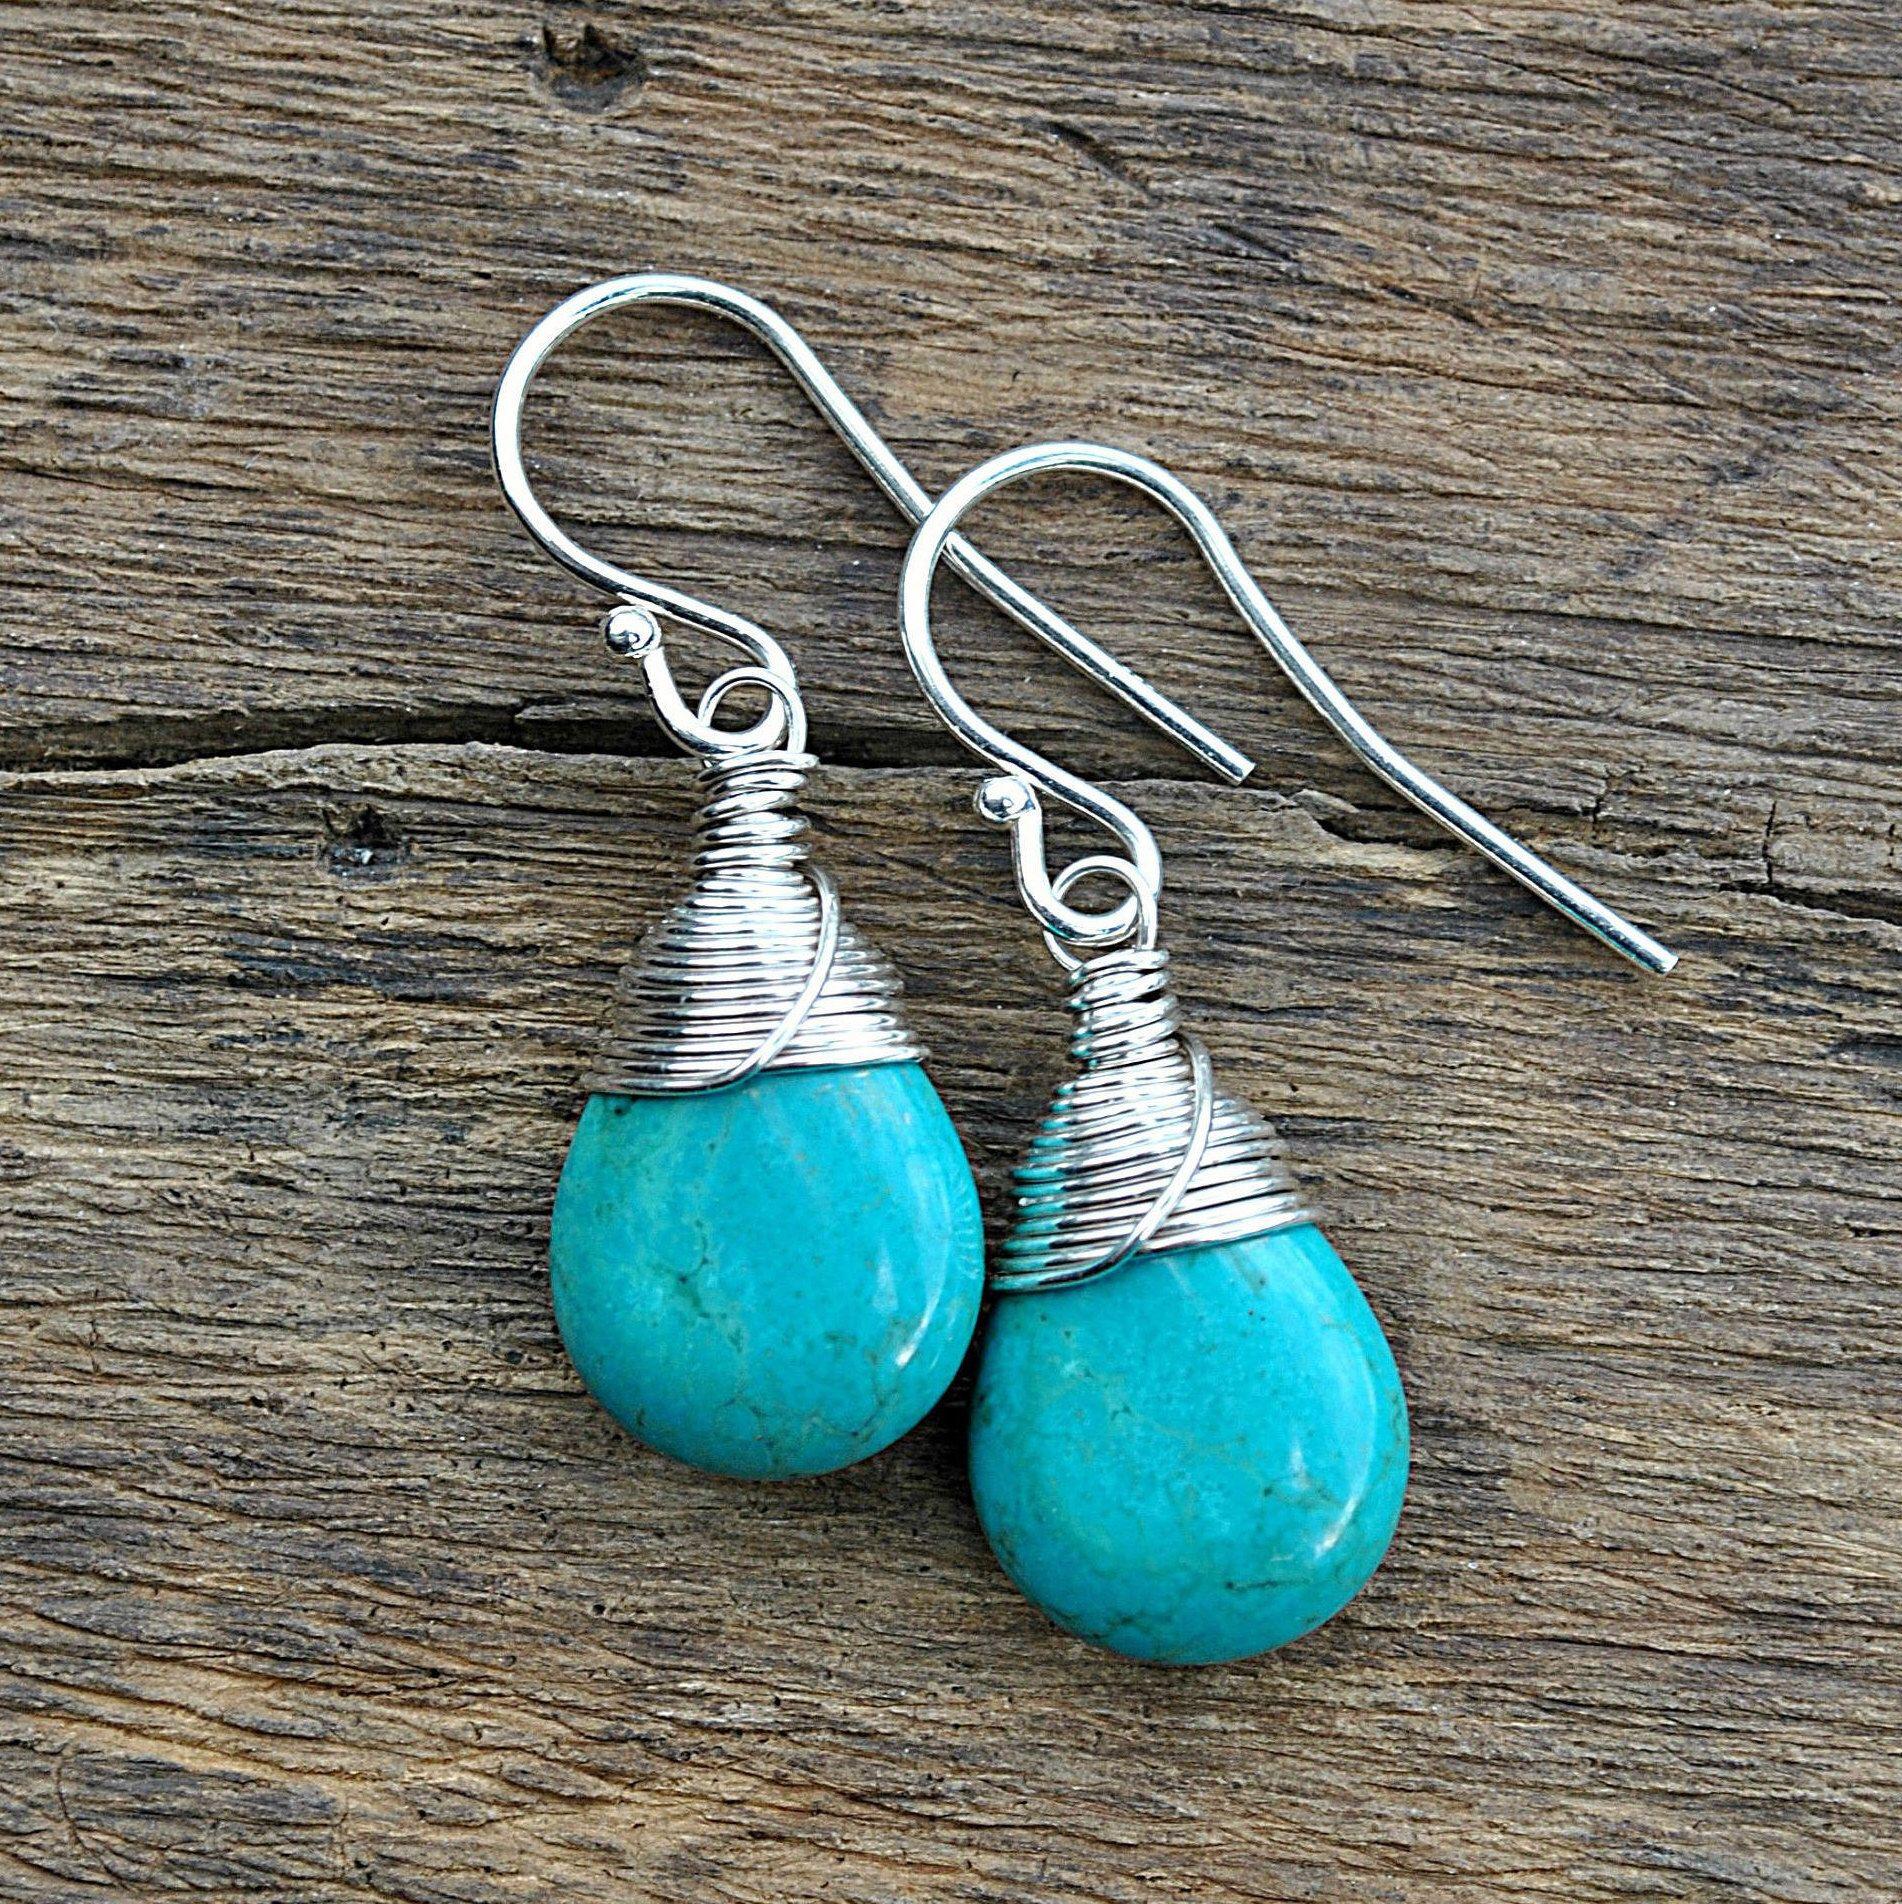 Turquoise Earrings Oxidized Sterling Silver Genuine Turquoise Dangle Earrings Real Turquoise Wire Wrapped Earrings Gift For Women